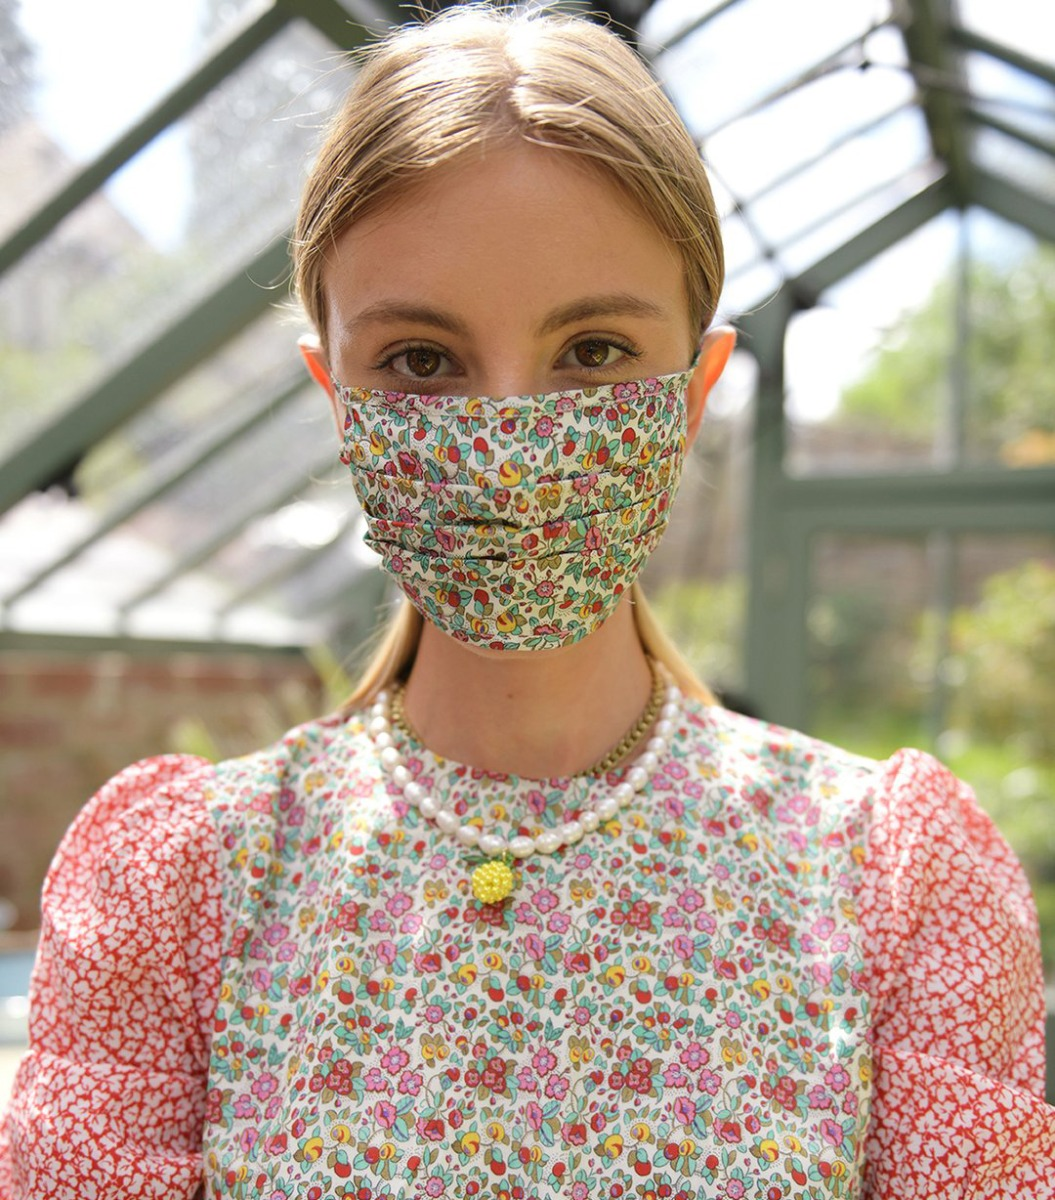 Rixo's Fashionable Face Coverings